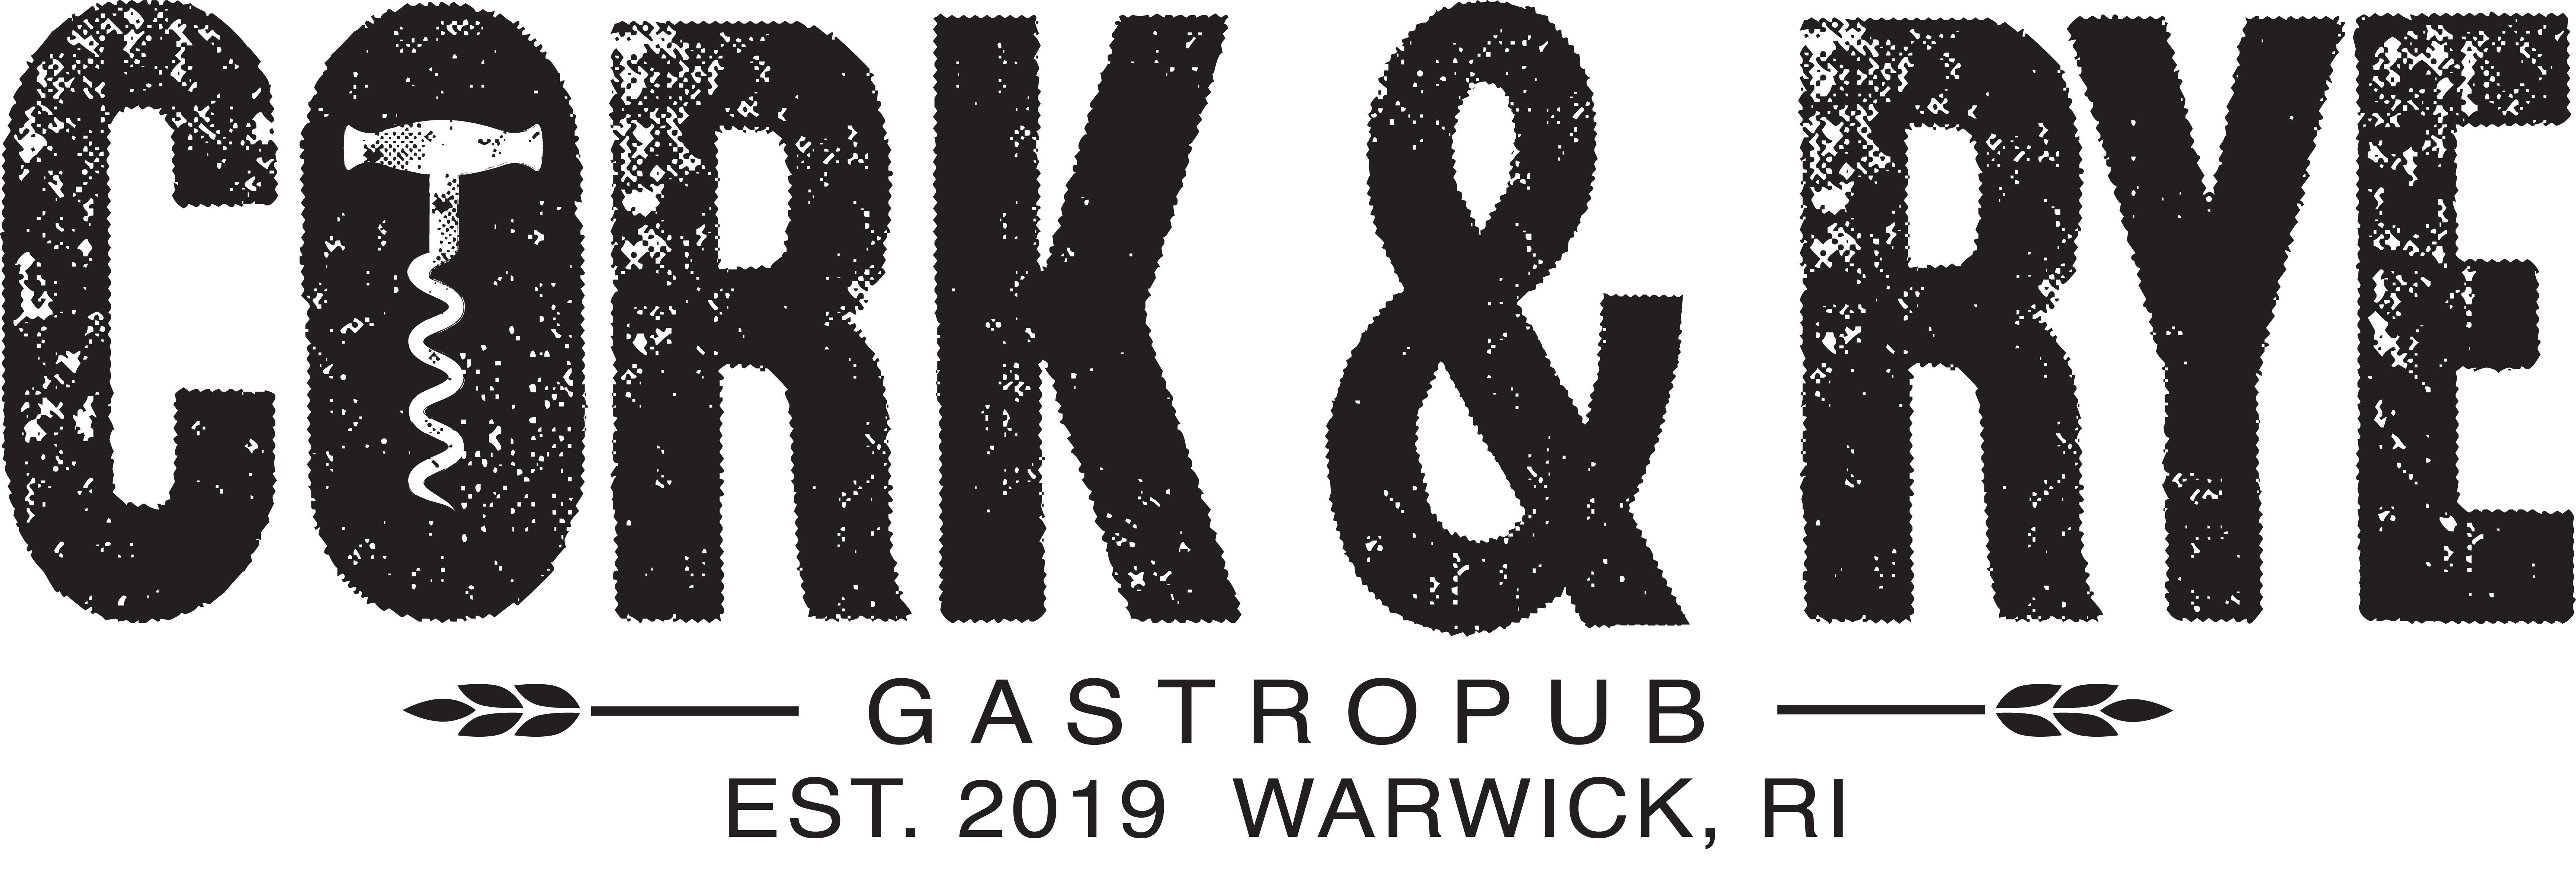 Cork & Rye Gastropub